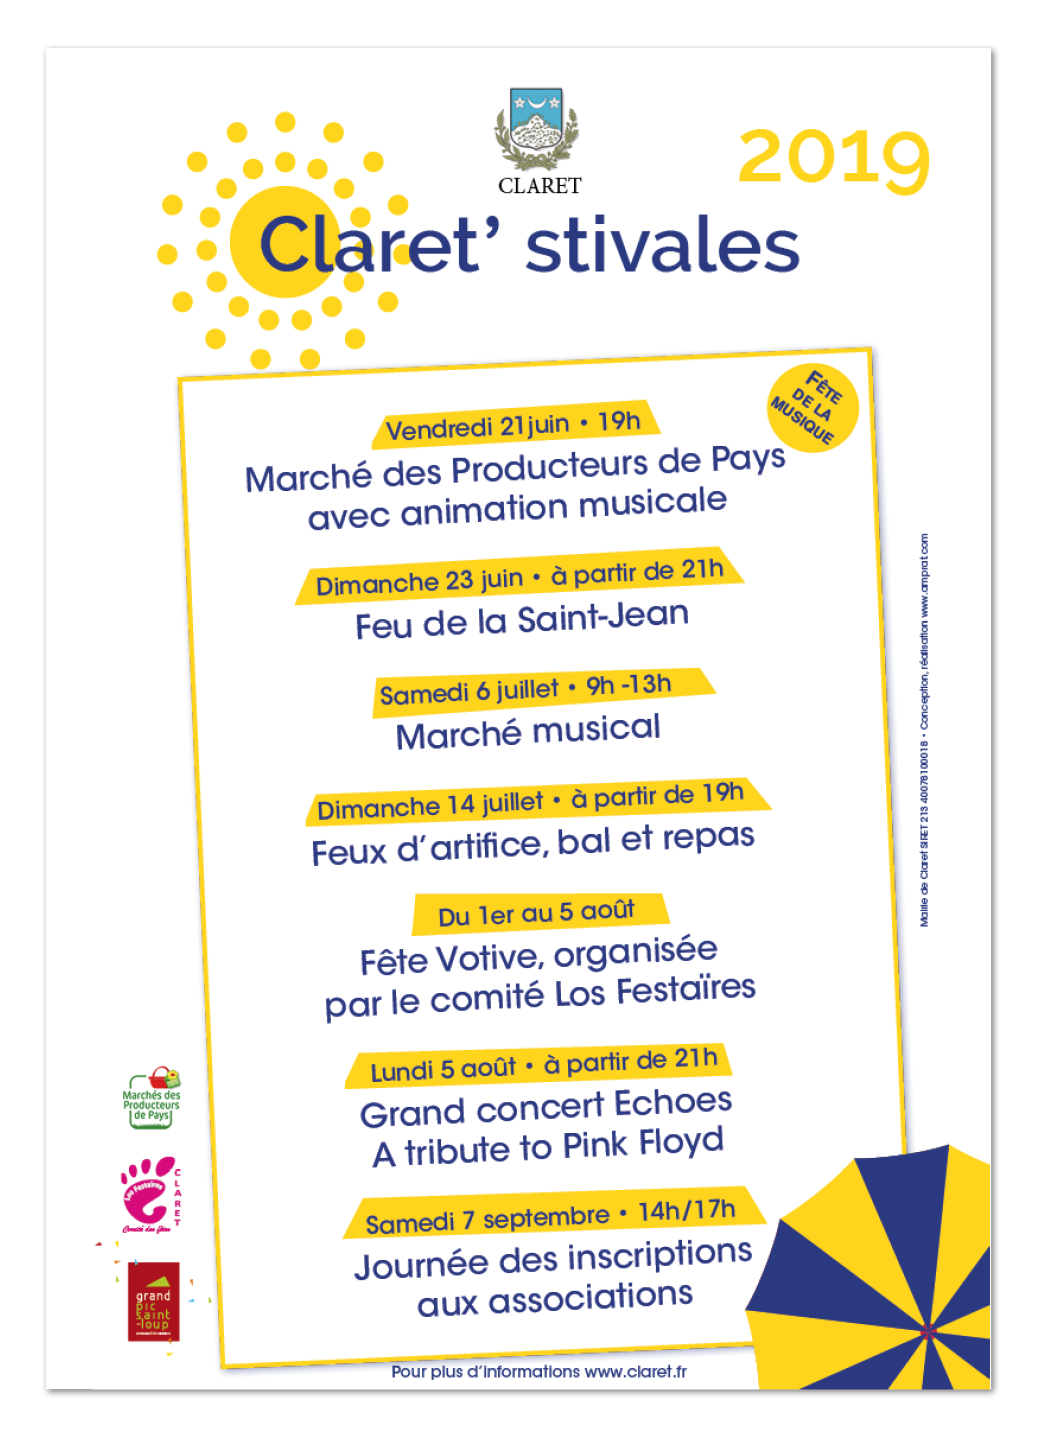 Claret'sitvales ∙ Anne-Marie Prat ∙ Design graphique et web